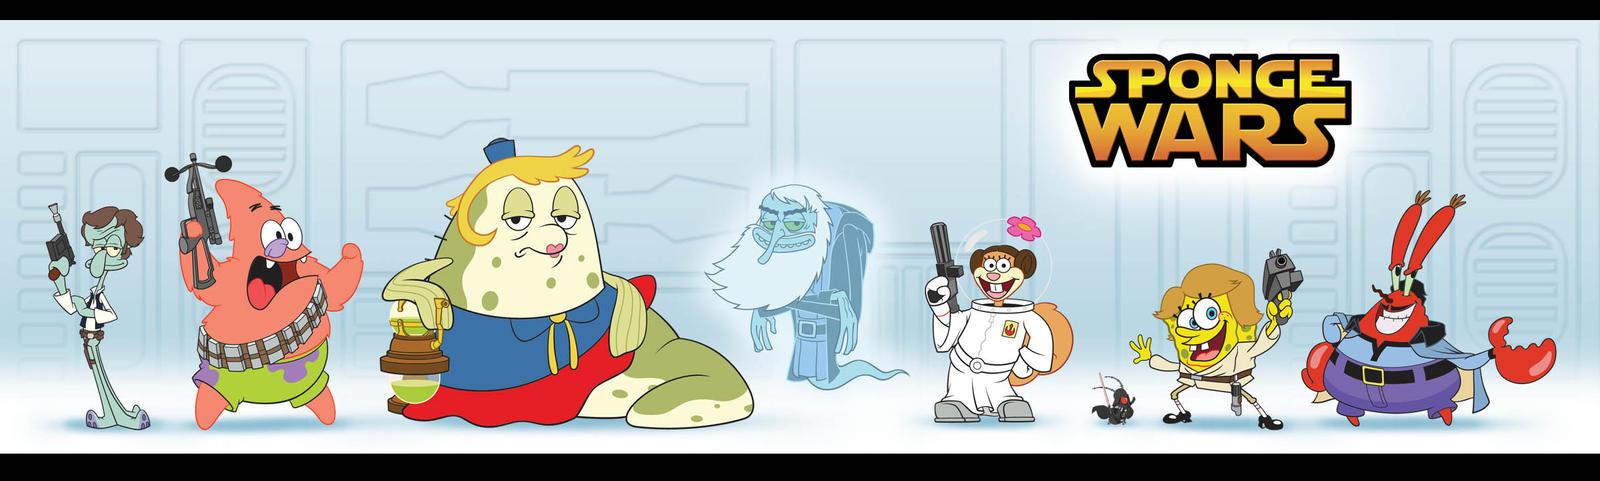 Sponge Wars by kidoho